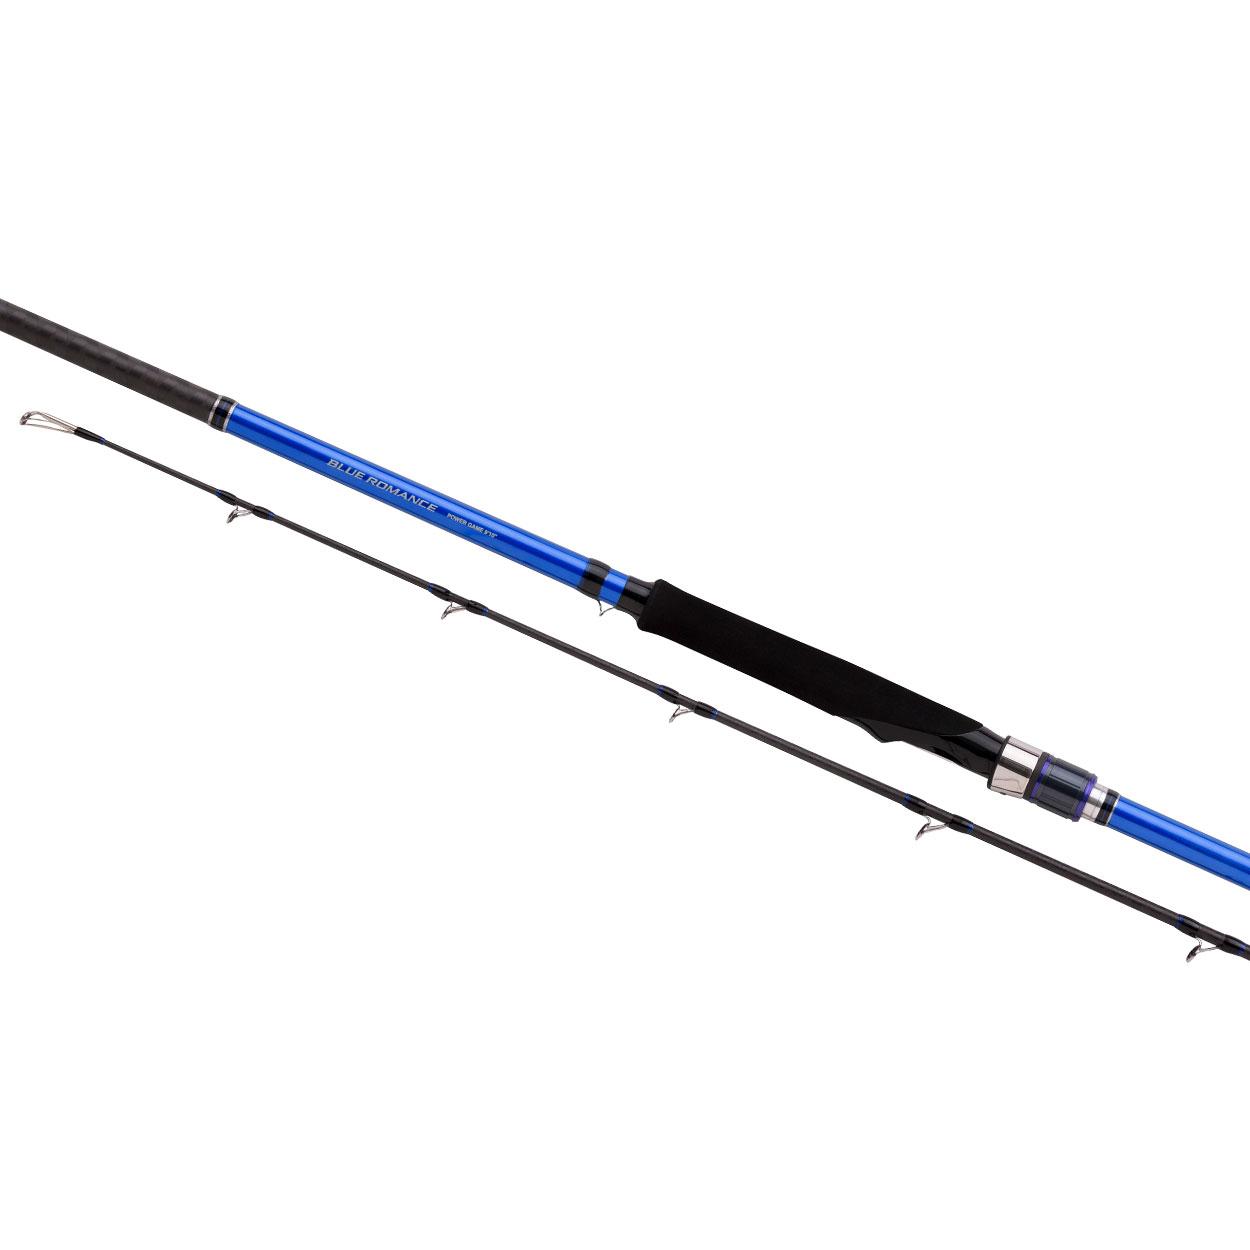 Shimano Blue Romance AX Powergame 244cm 40 80g